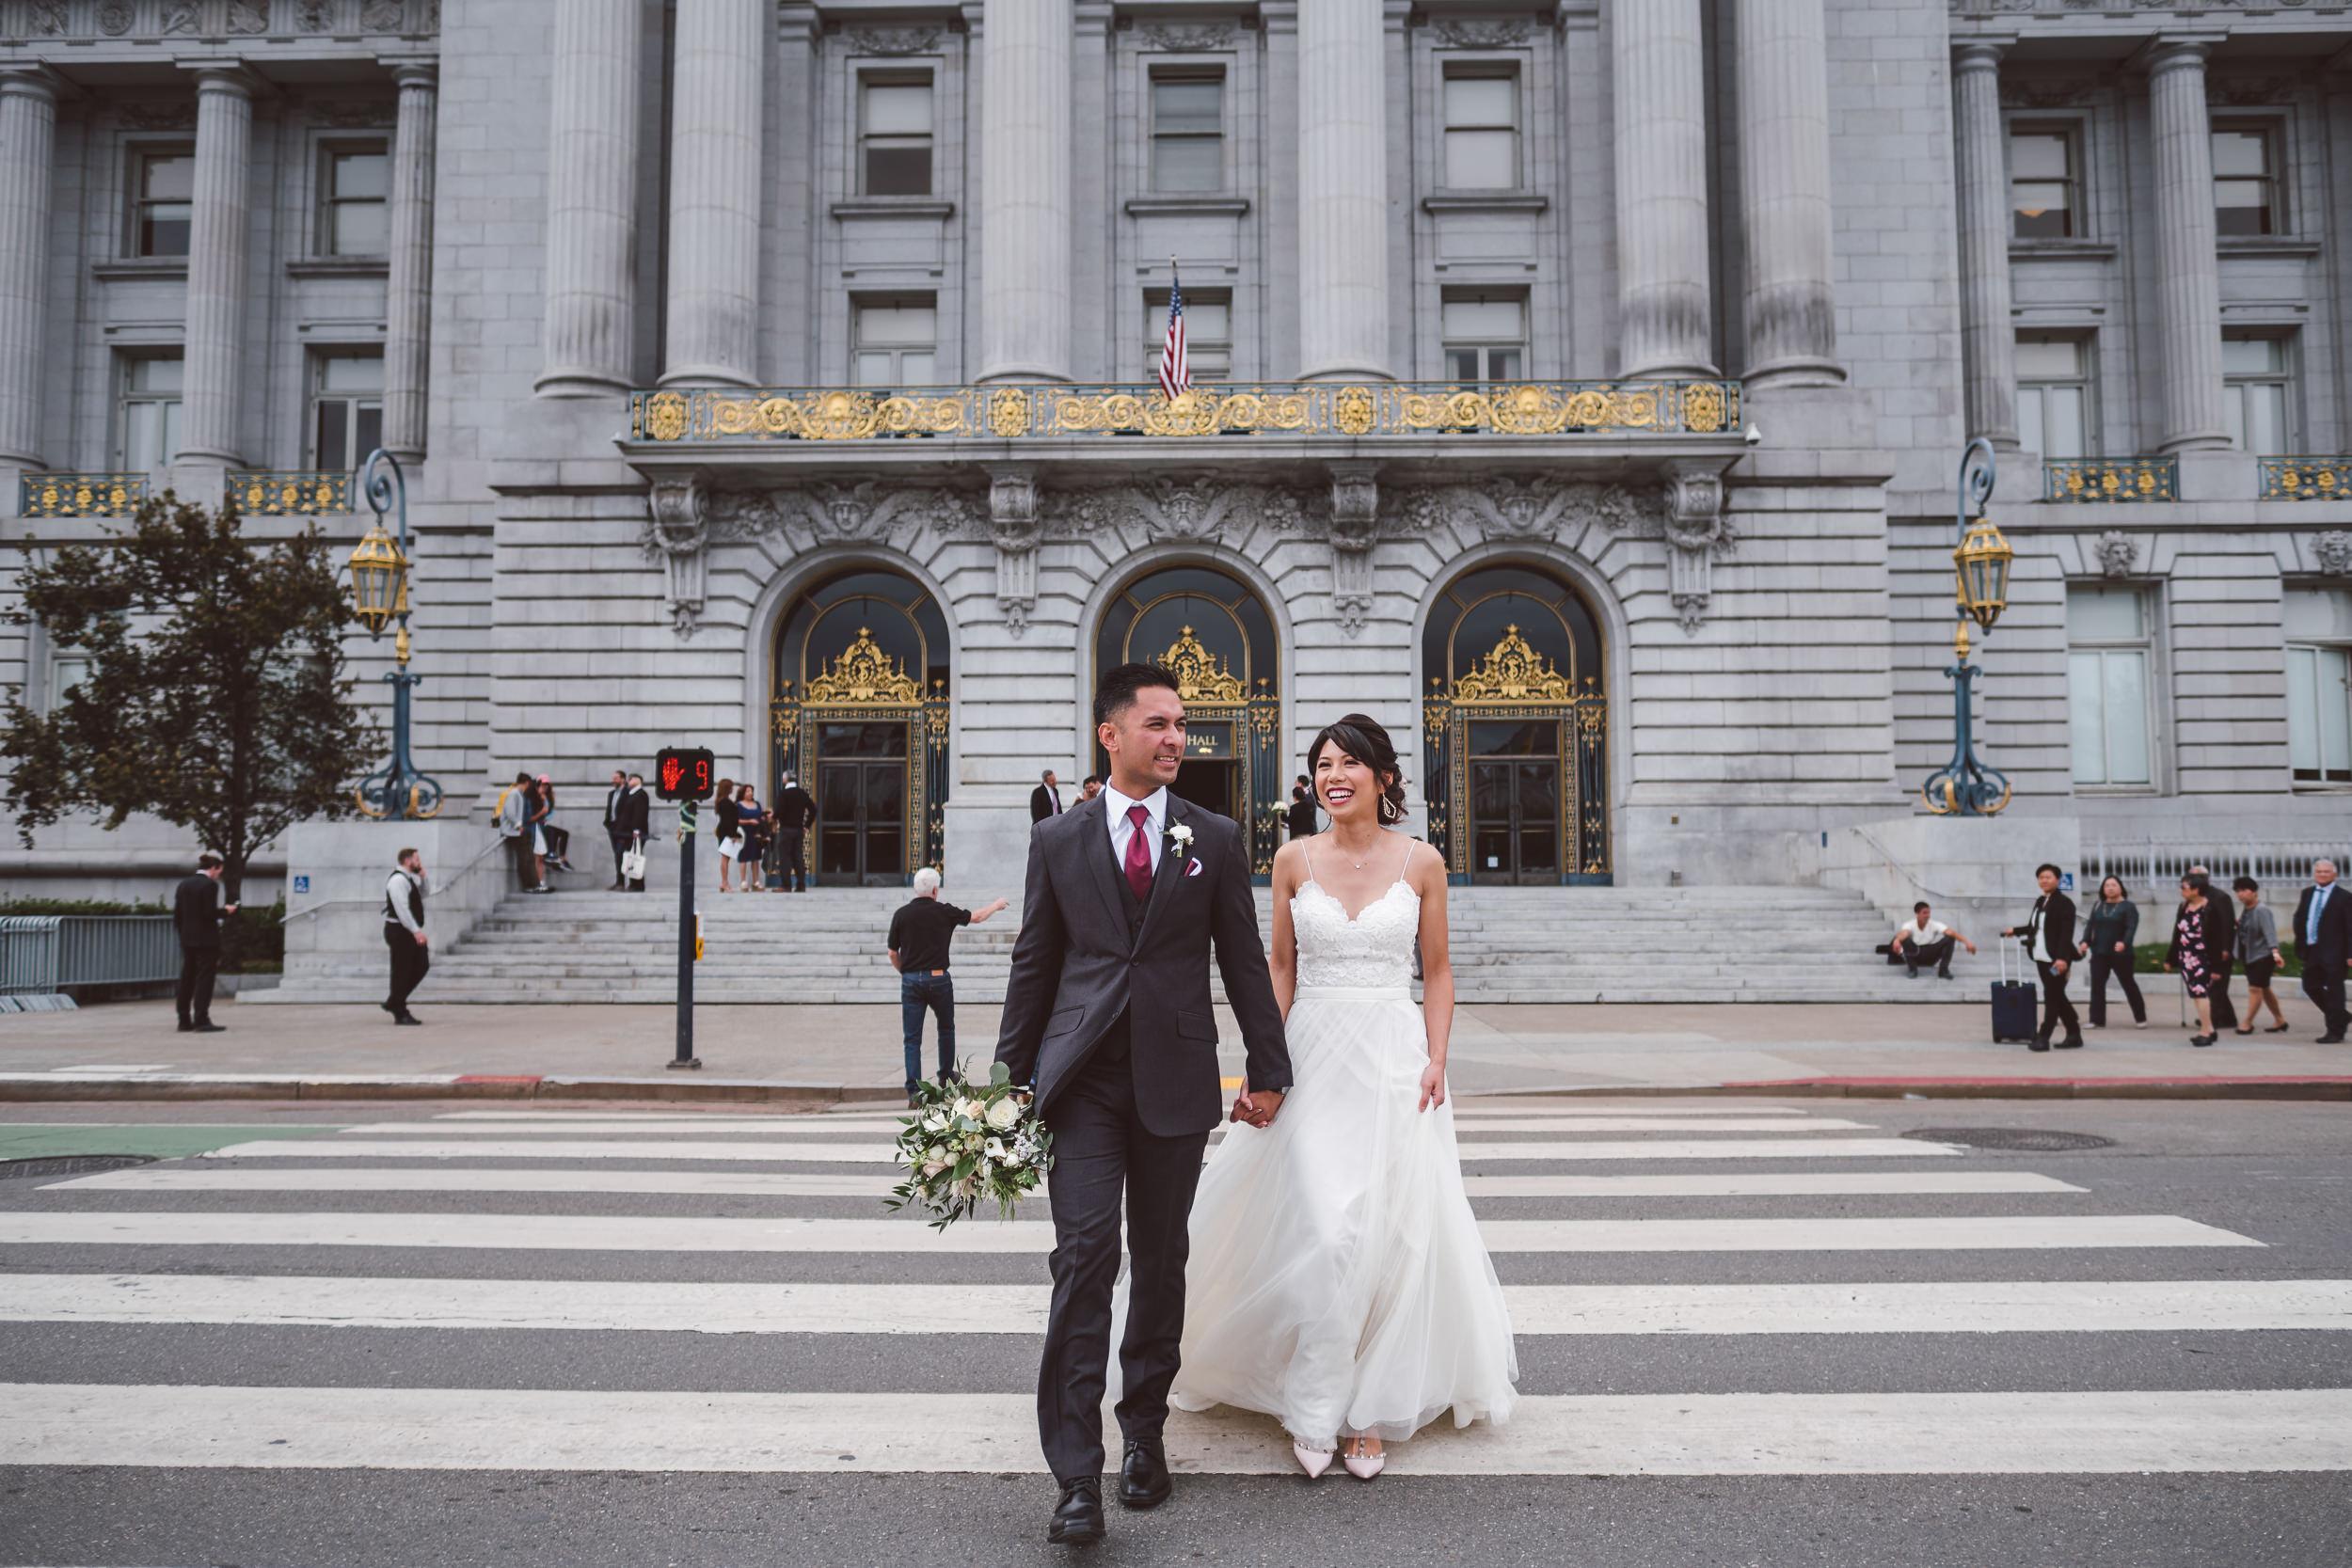 San-Francisco-City-Hall-Wedding-Photography-071.jpg